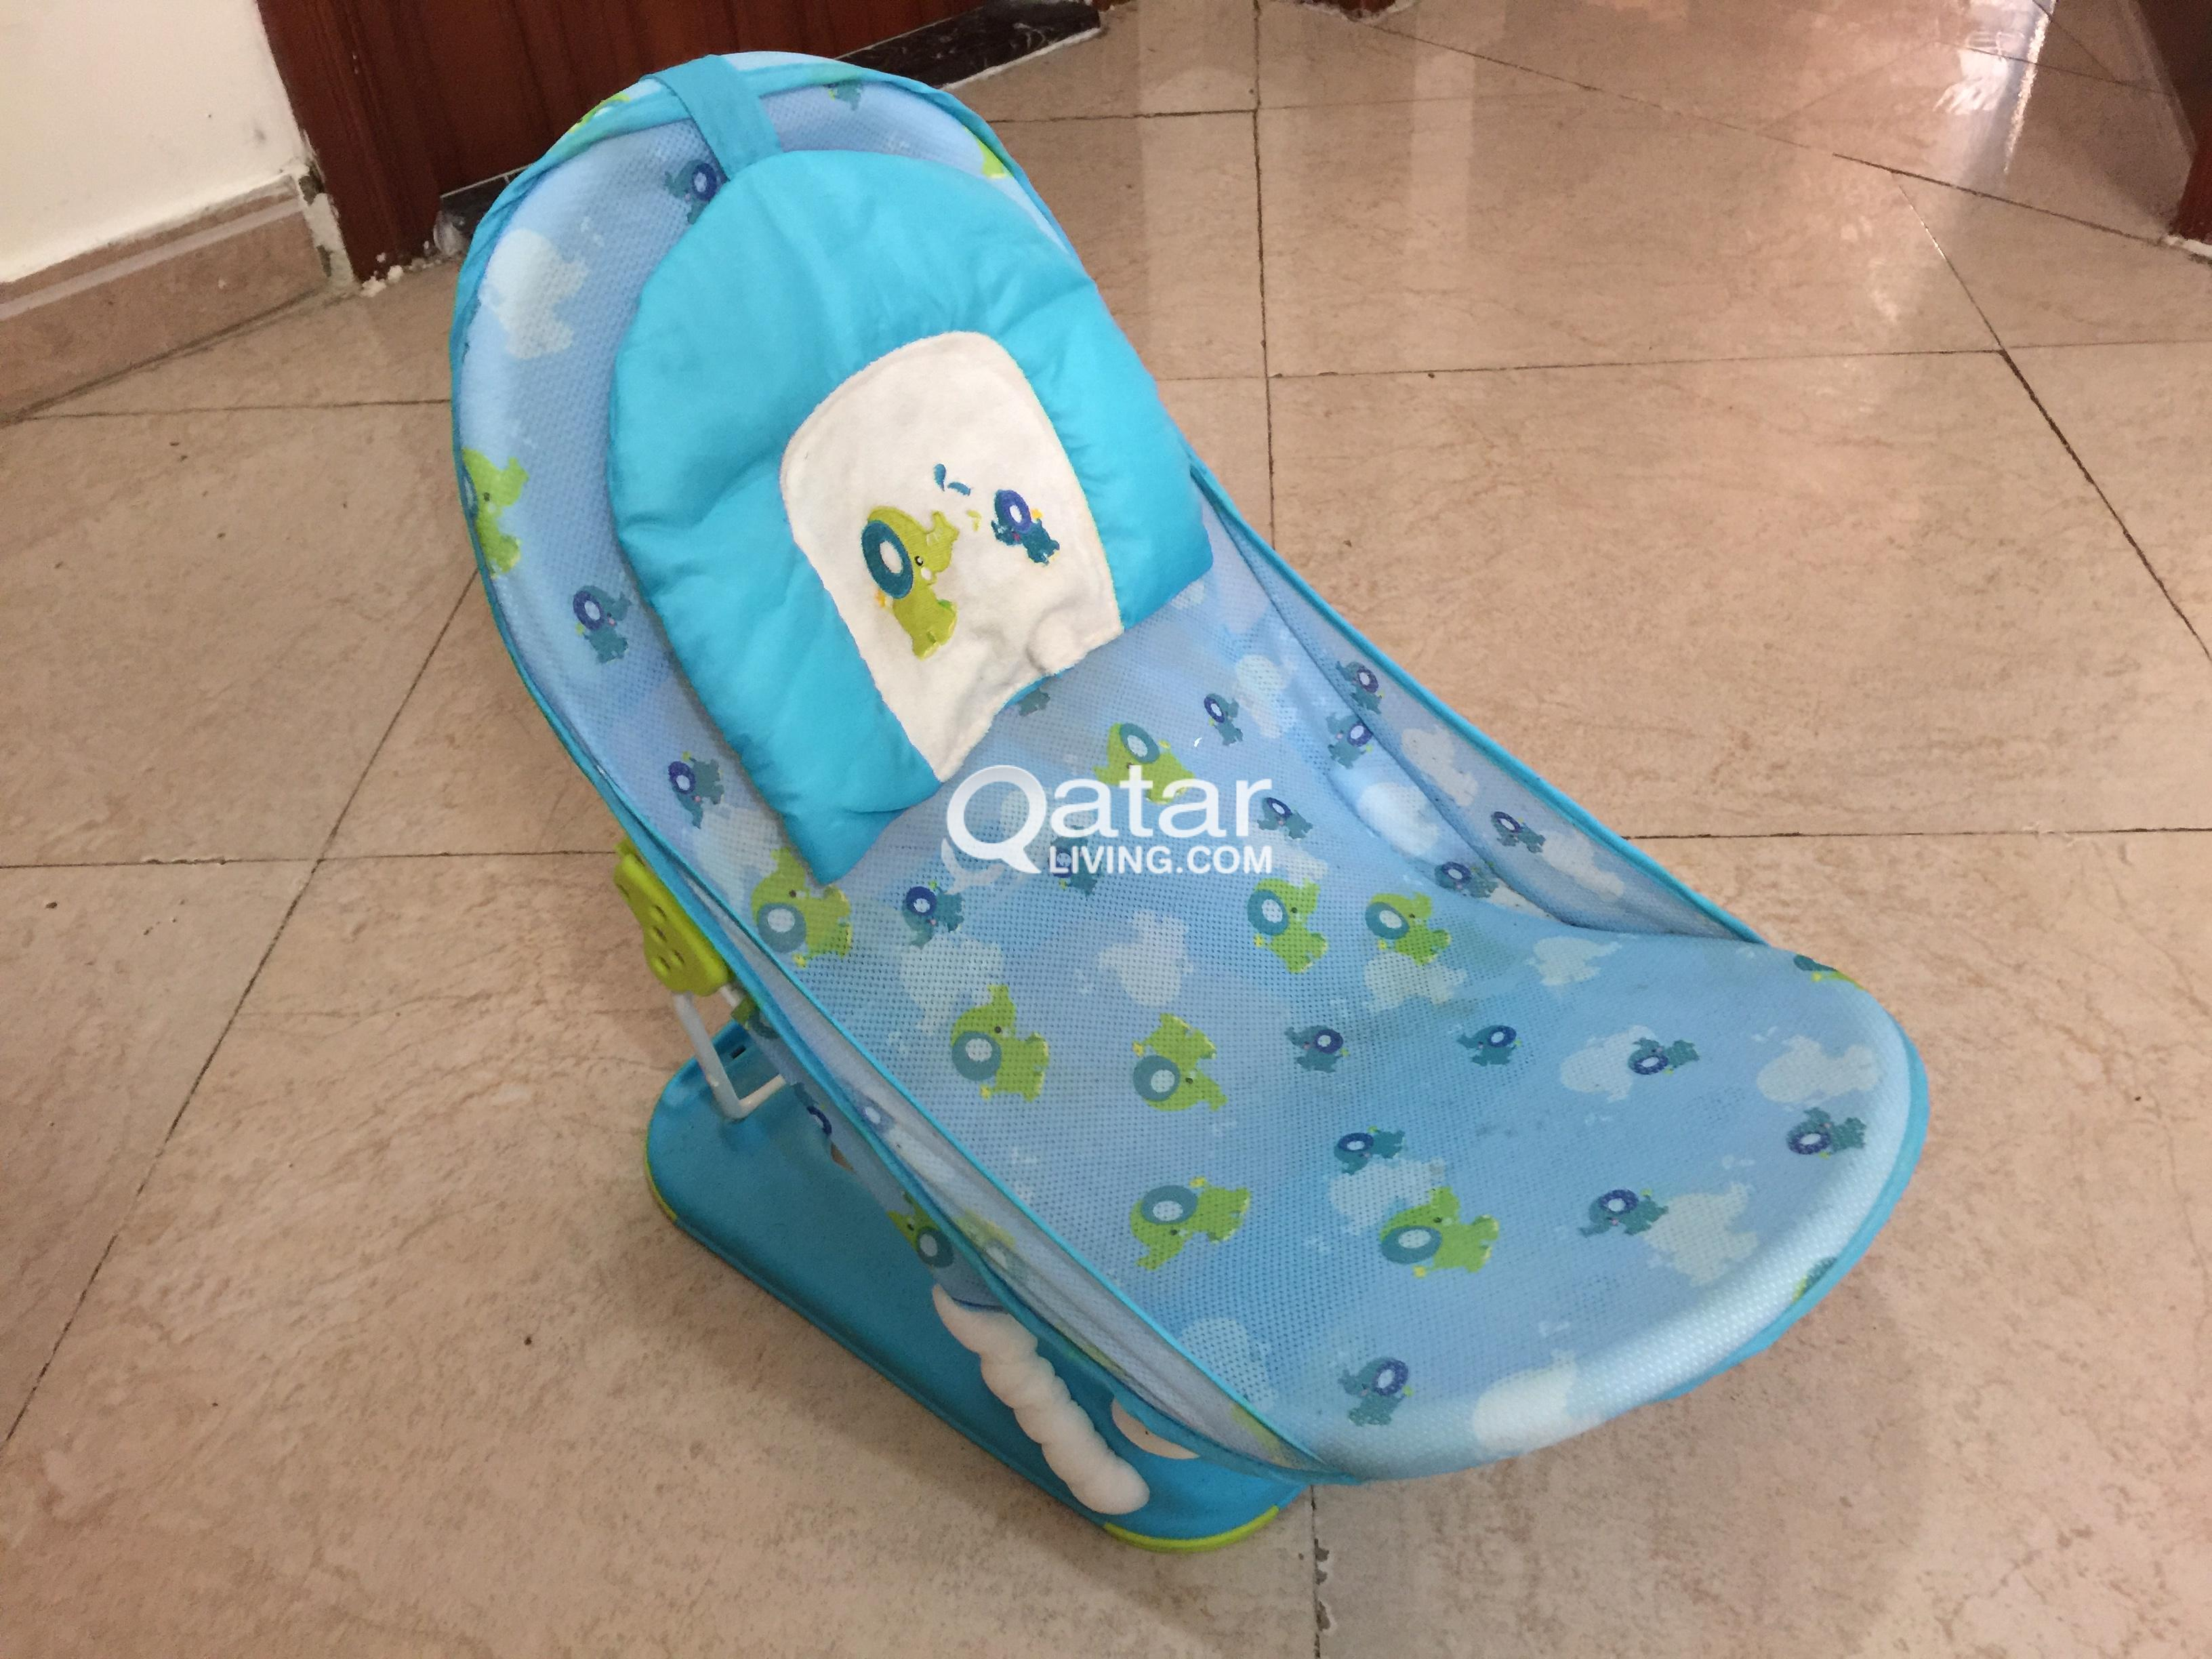 KIds Pram/Chair/Bathing Chair/Study Table with Chair | Qatar Living